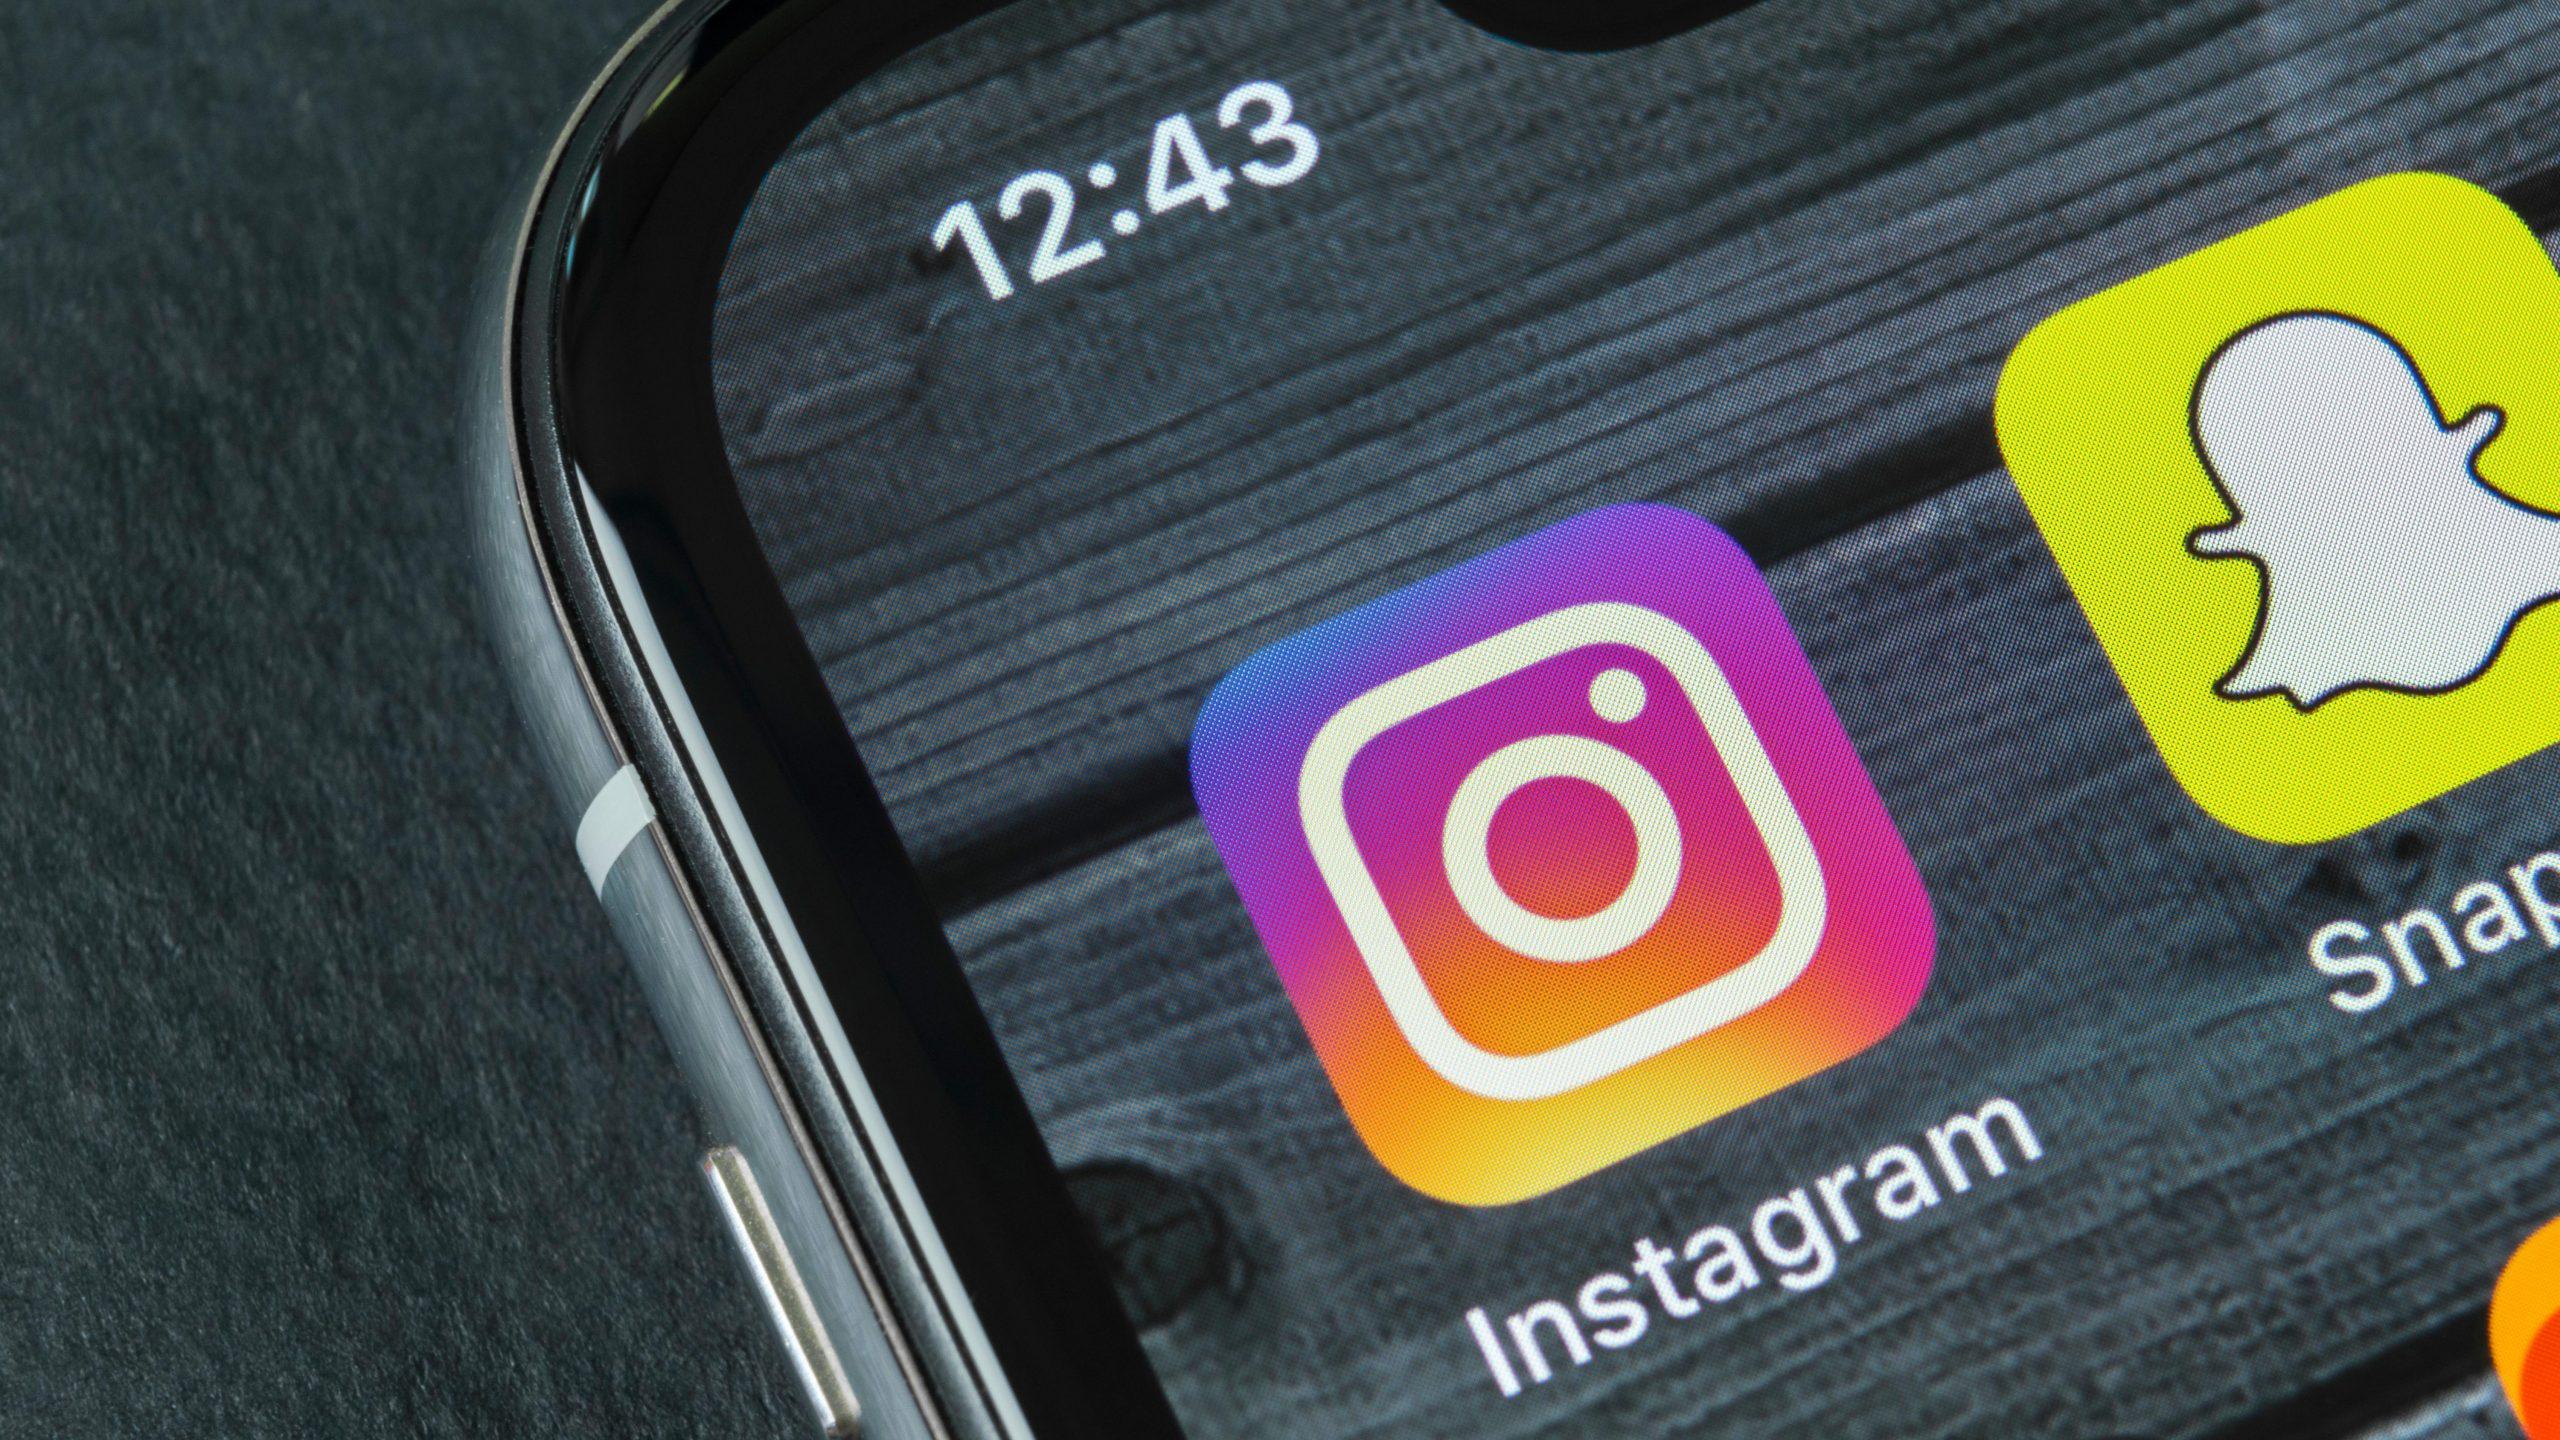 Instagrami algoritm juhib aktifotosid